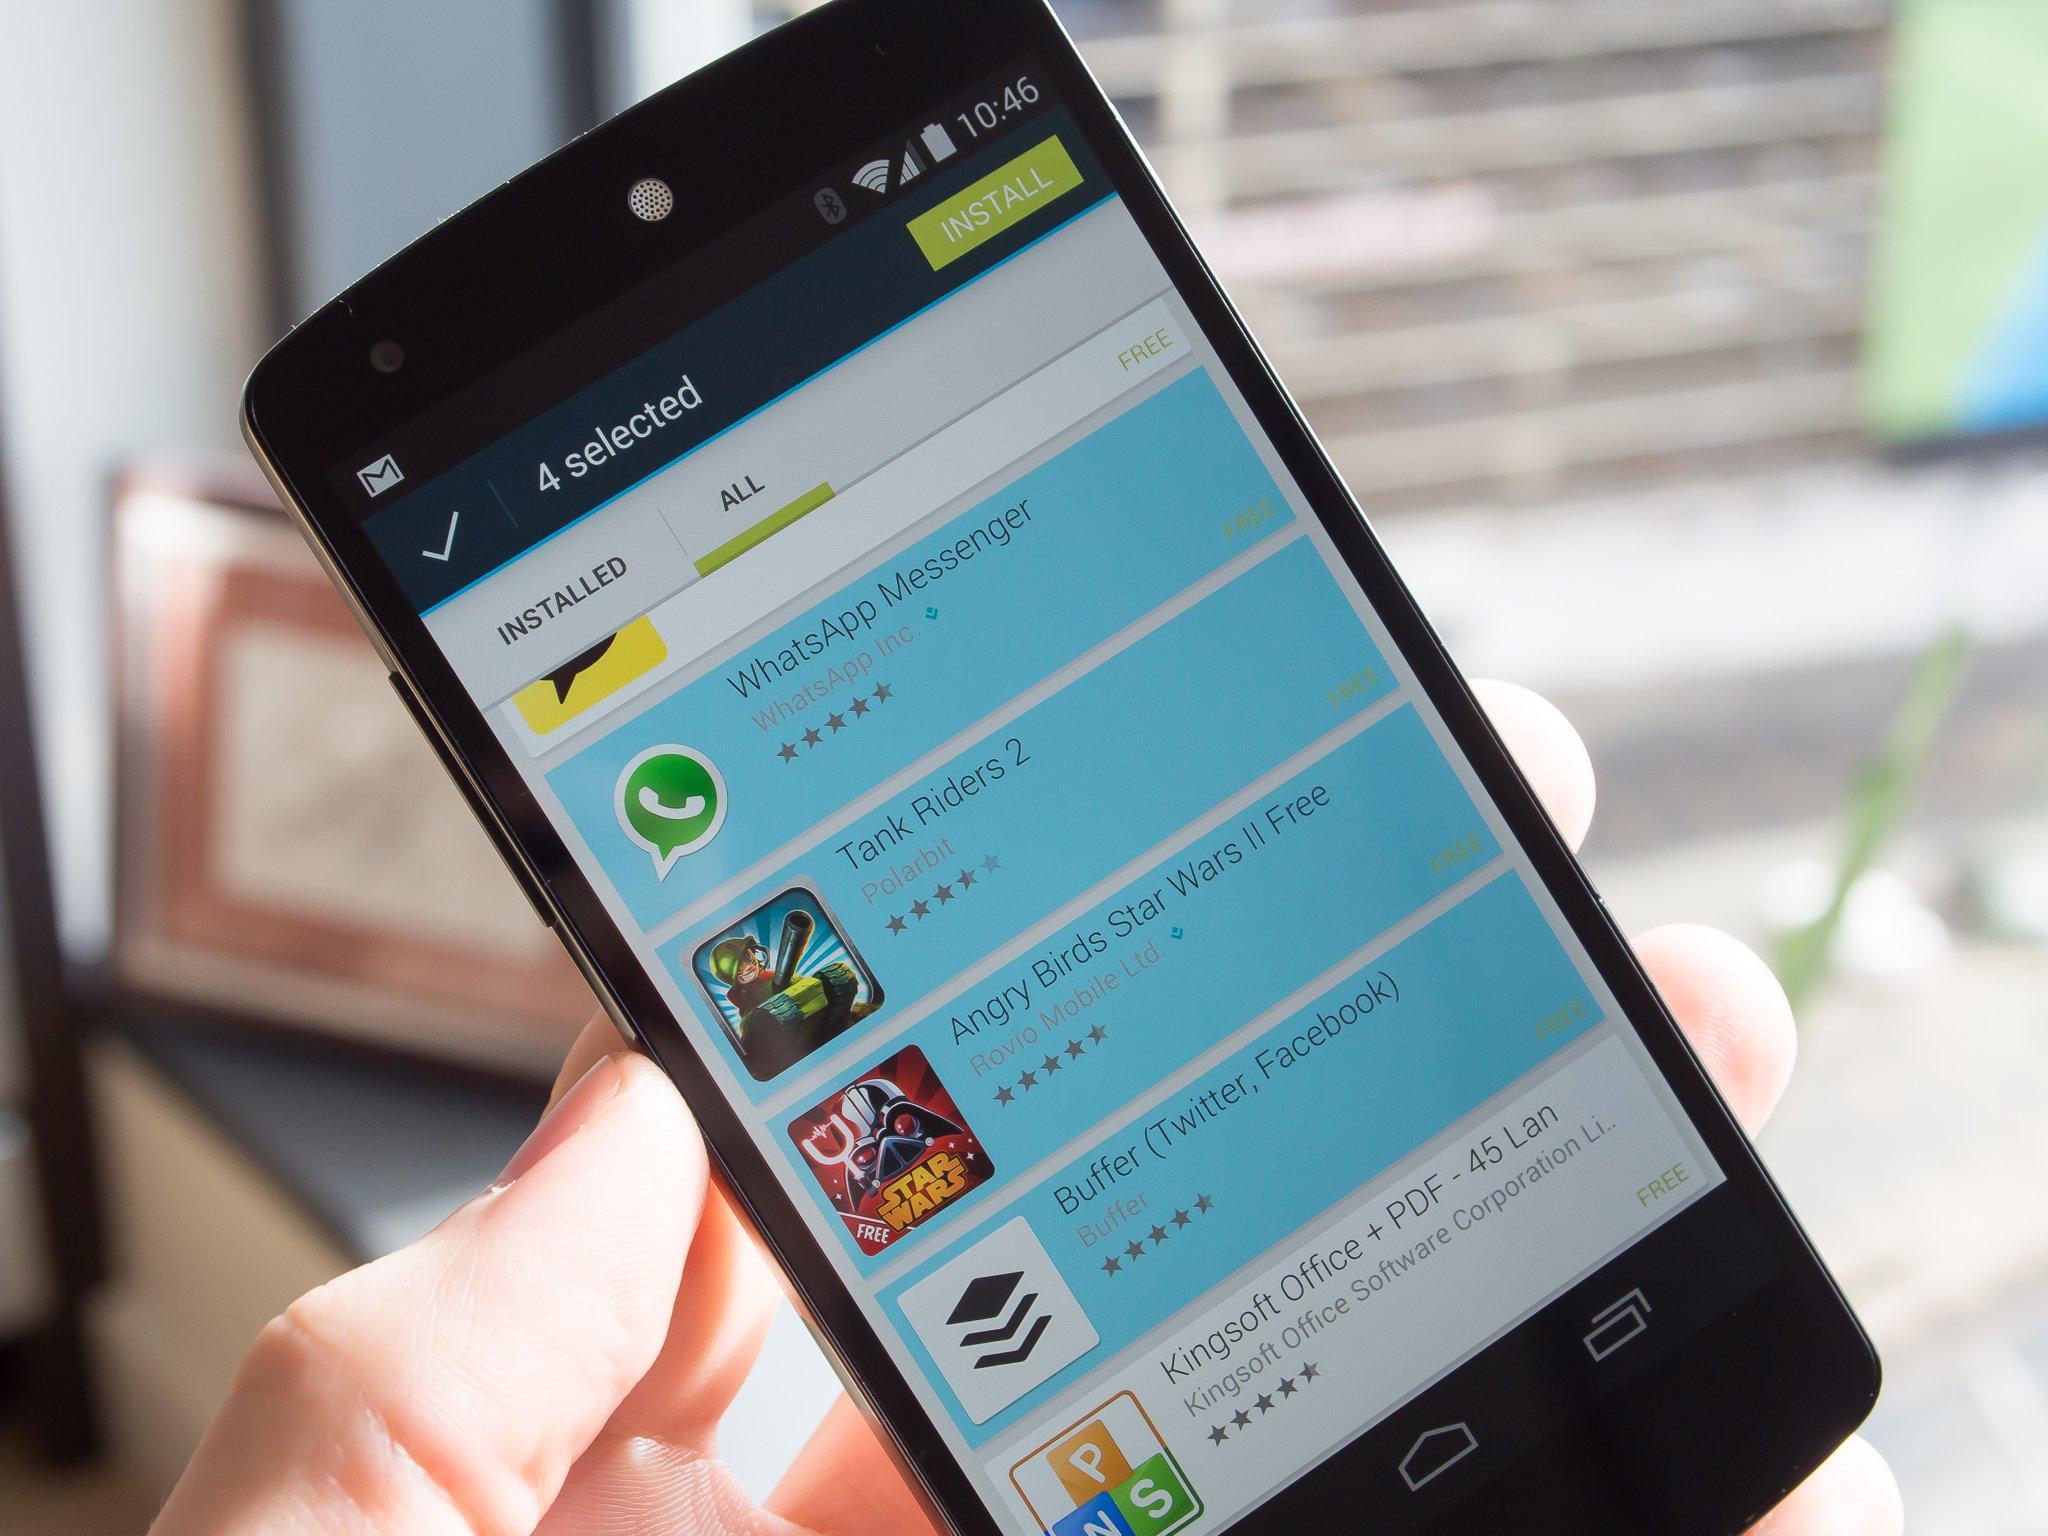 Google Play Store 4.6.16